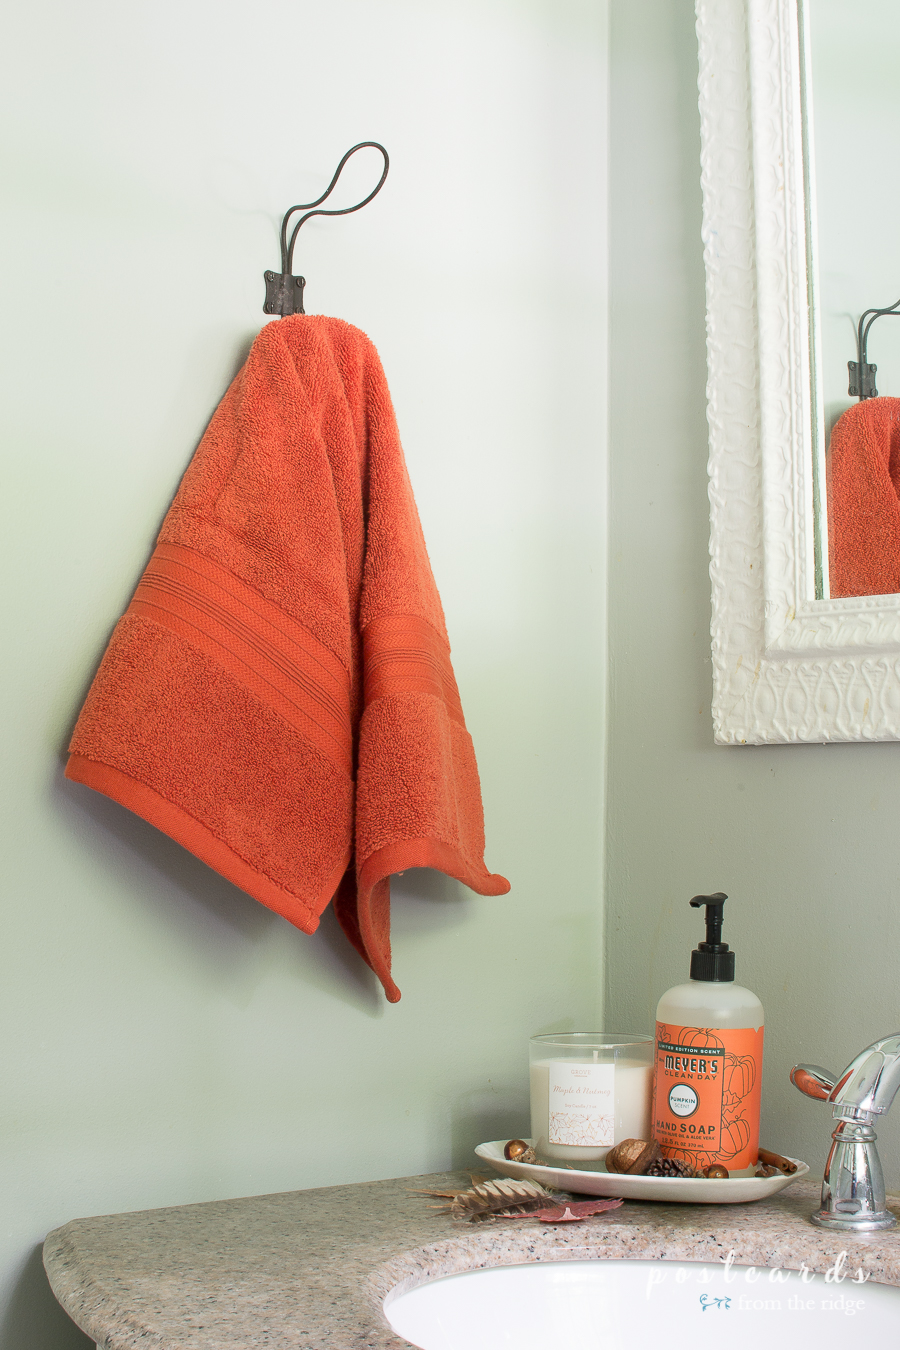 orange towel and pumpkin mrs meyers hand soap